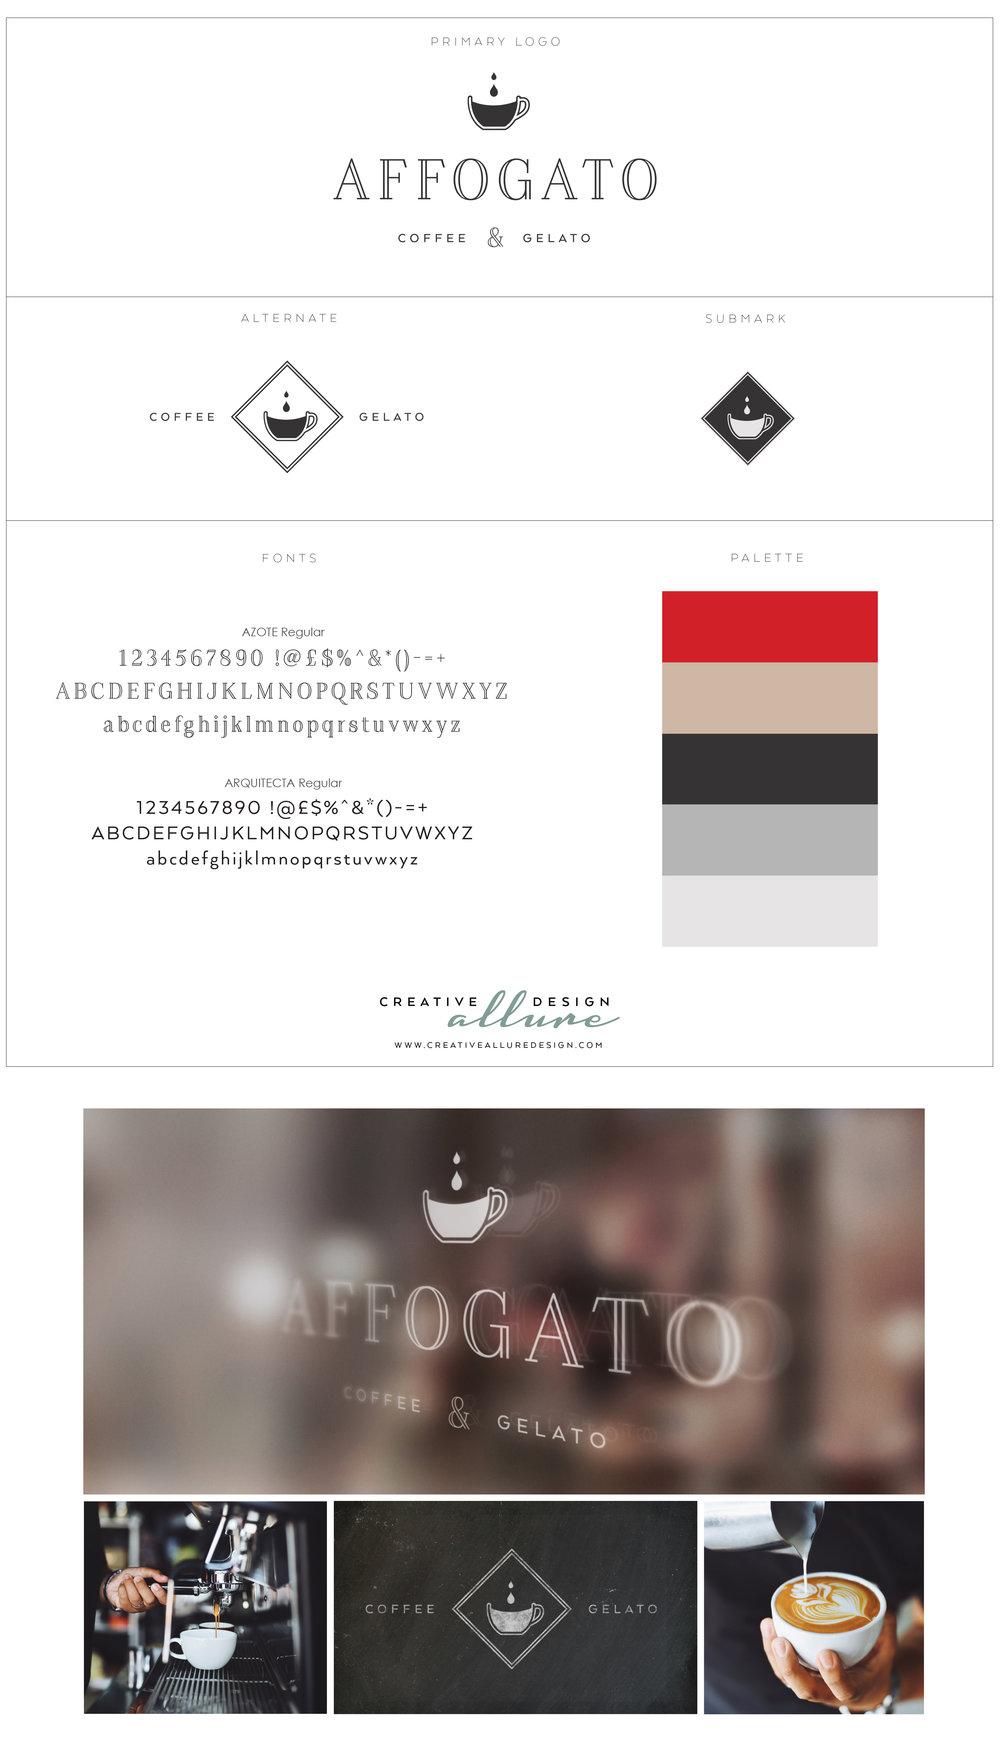 AFFOGATO PORT-2.jpg